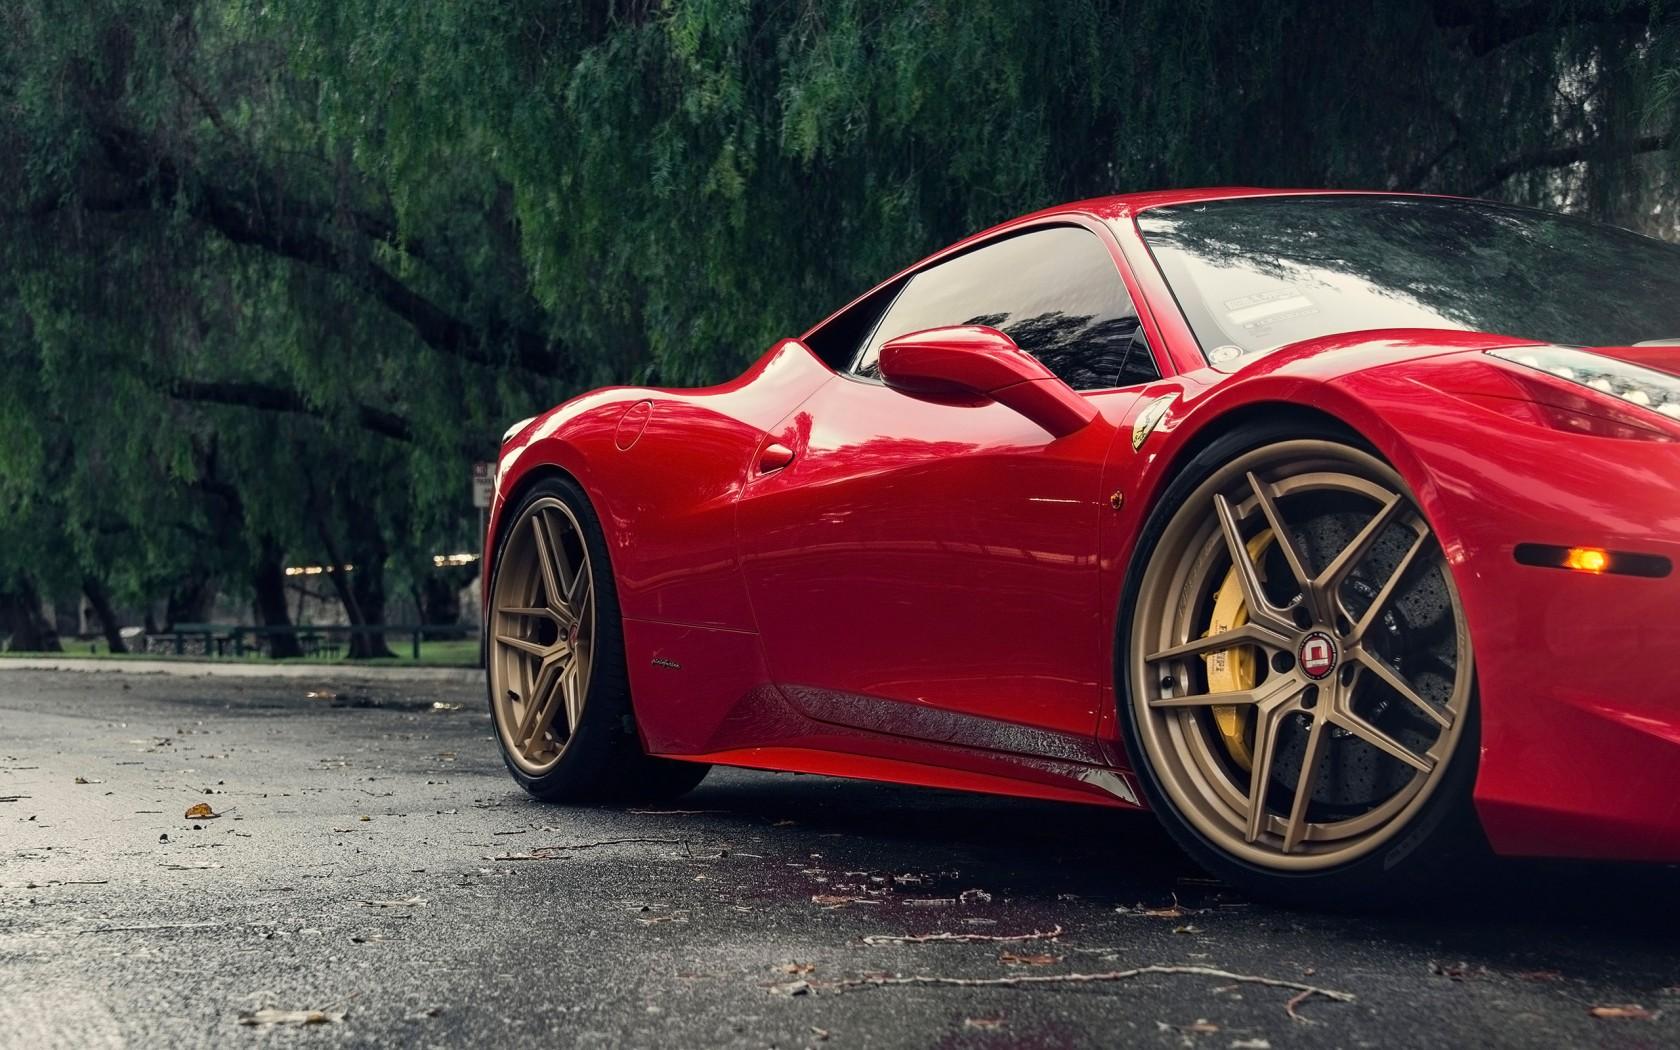 Lamborghini Cars Wallpapers Free Download 2015 Klassen Id Ferrari 458 Italia 2 Wallpaper Hd Car